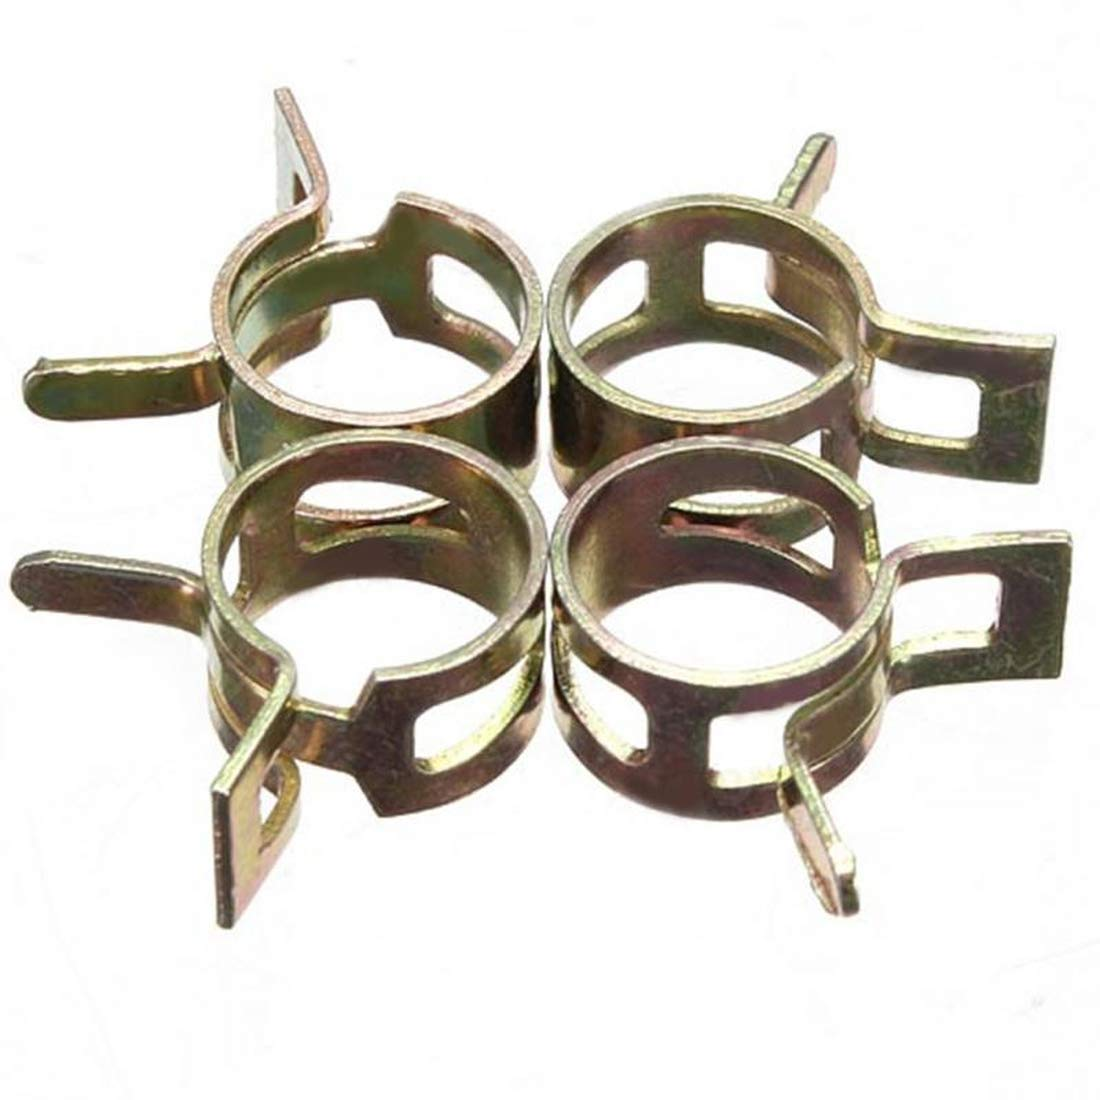 ATezi 10 PCS 6-15mm Ressort Bande Clips De Tuyau De Carburant Conduits De Carburant Clips De Tuyau deau Tuyau dair Tube De Silicone Aspirateur Tuyau Pince Fixation